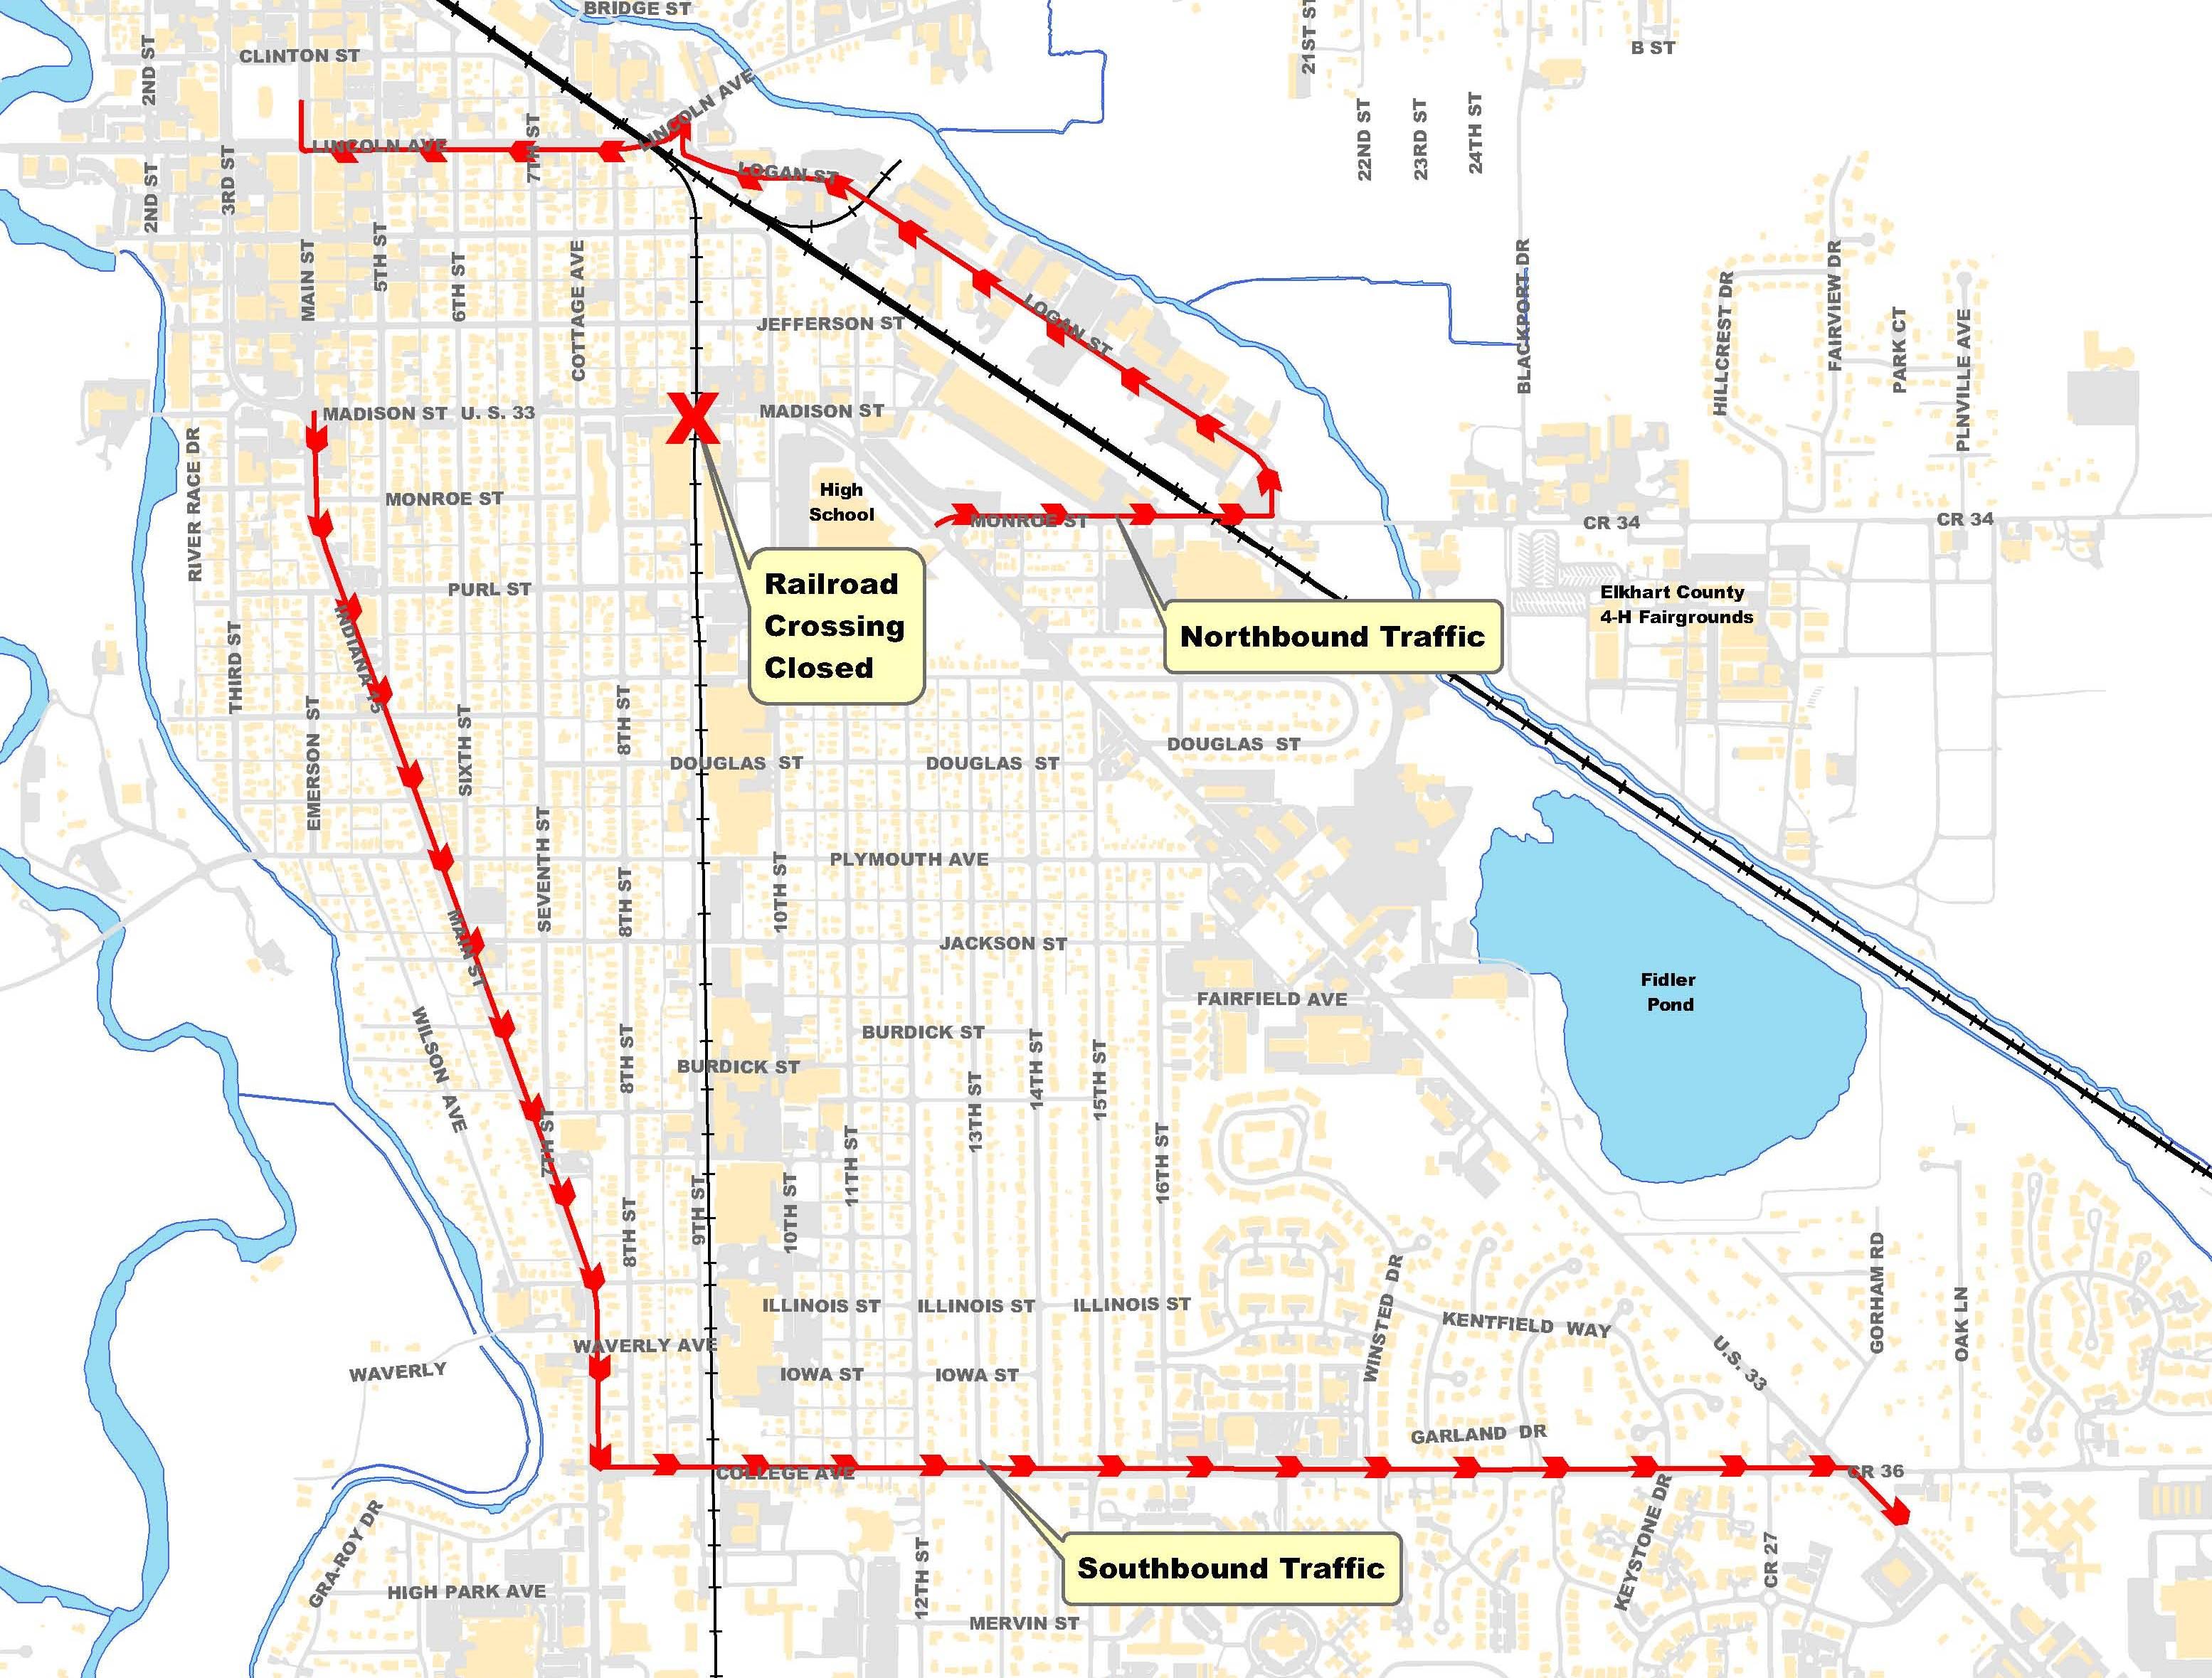 US MADISON STREET RAILROAD CROSSING CLOSURE News - Us railroad map 2016